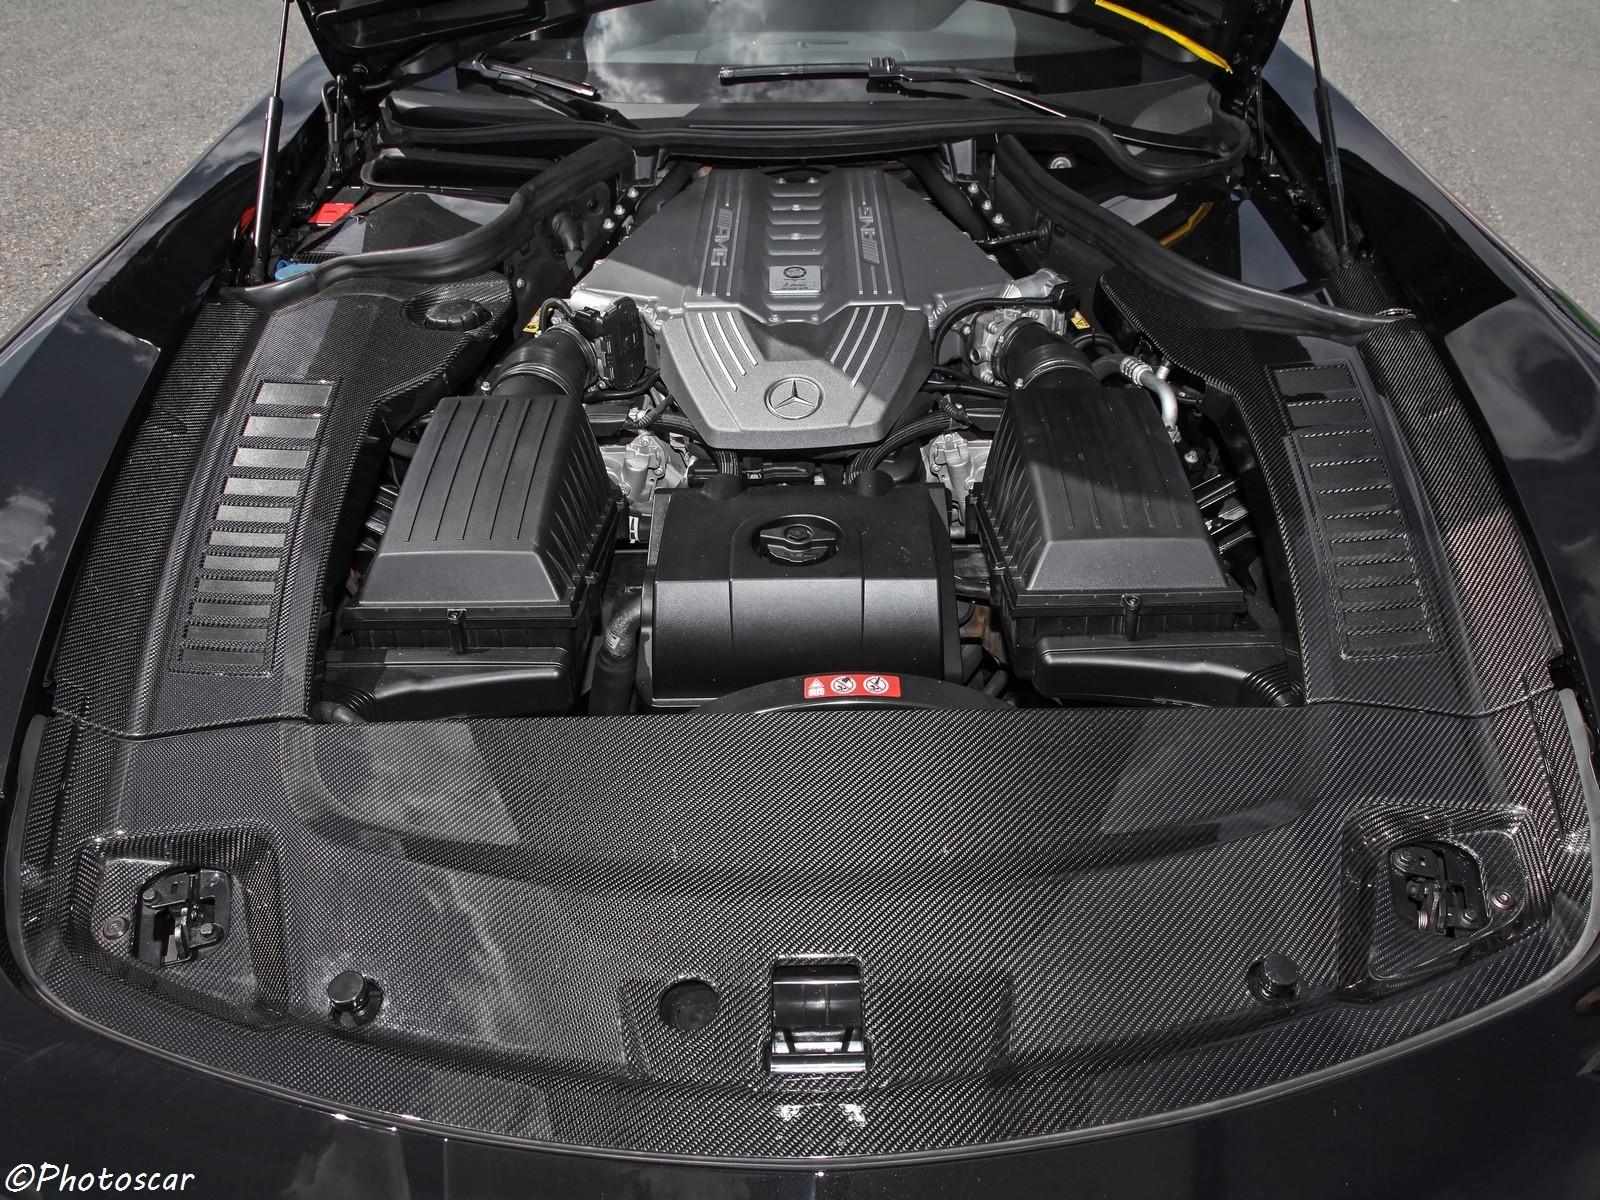 INDEN Design Mercedes SLS 63 AMG Black Series C197 2017